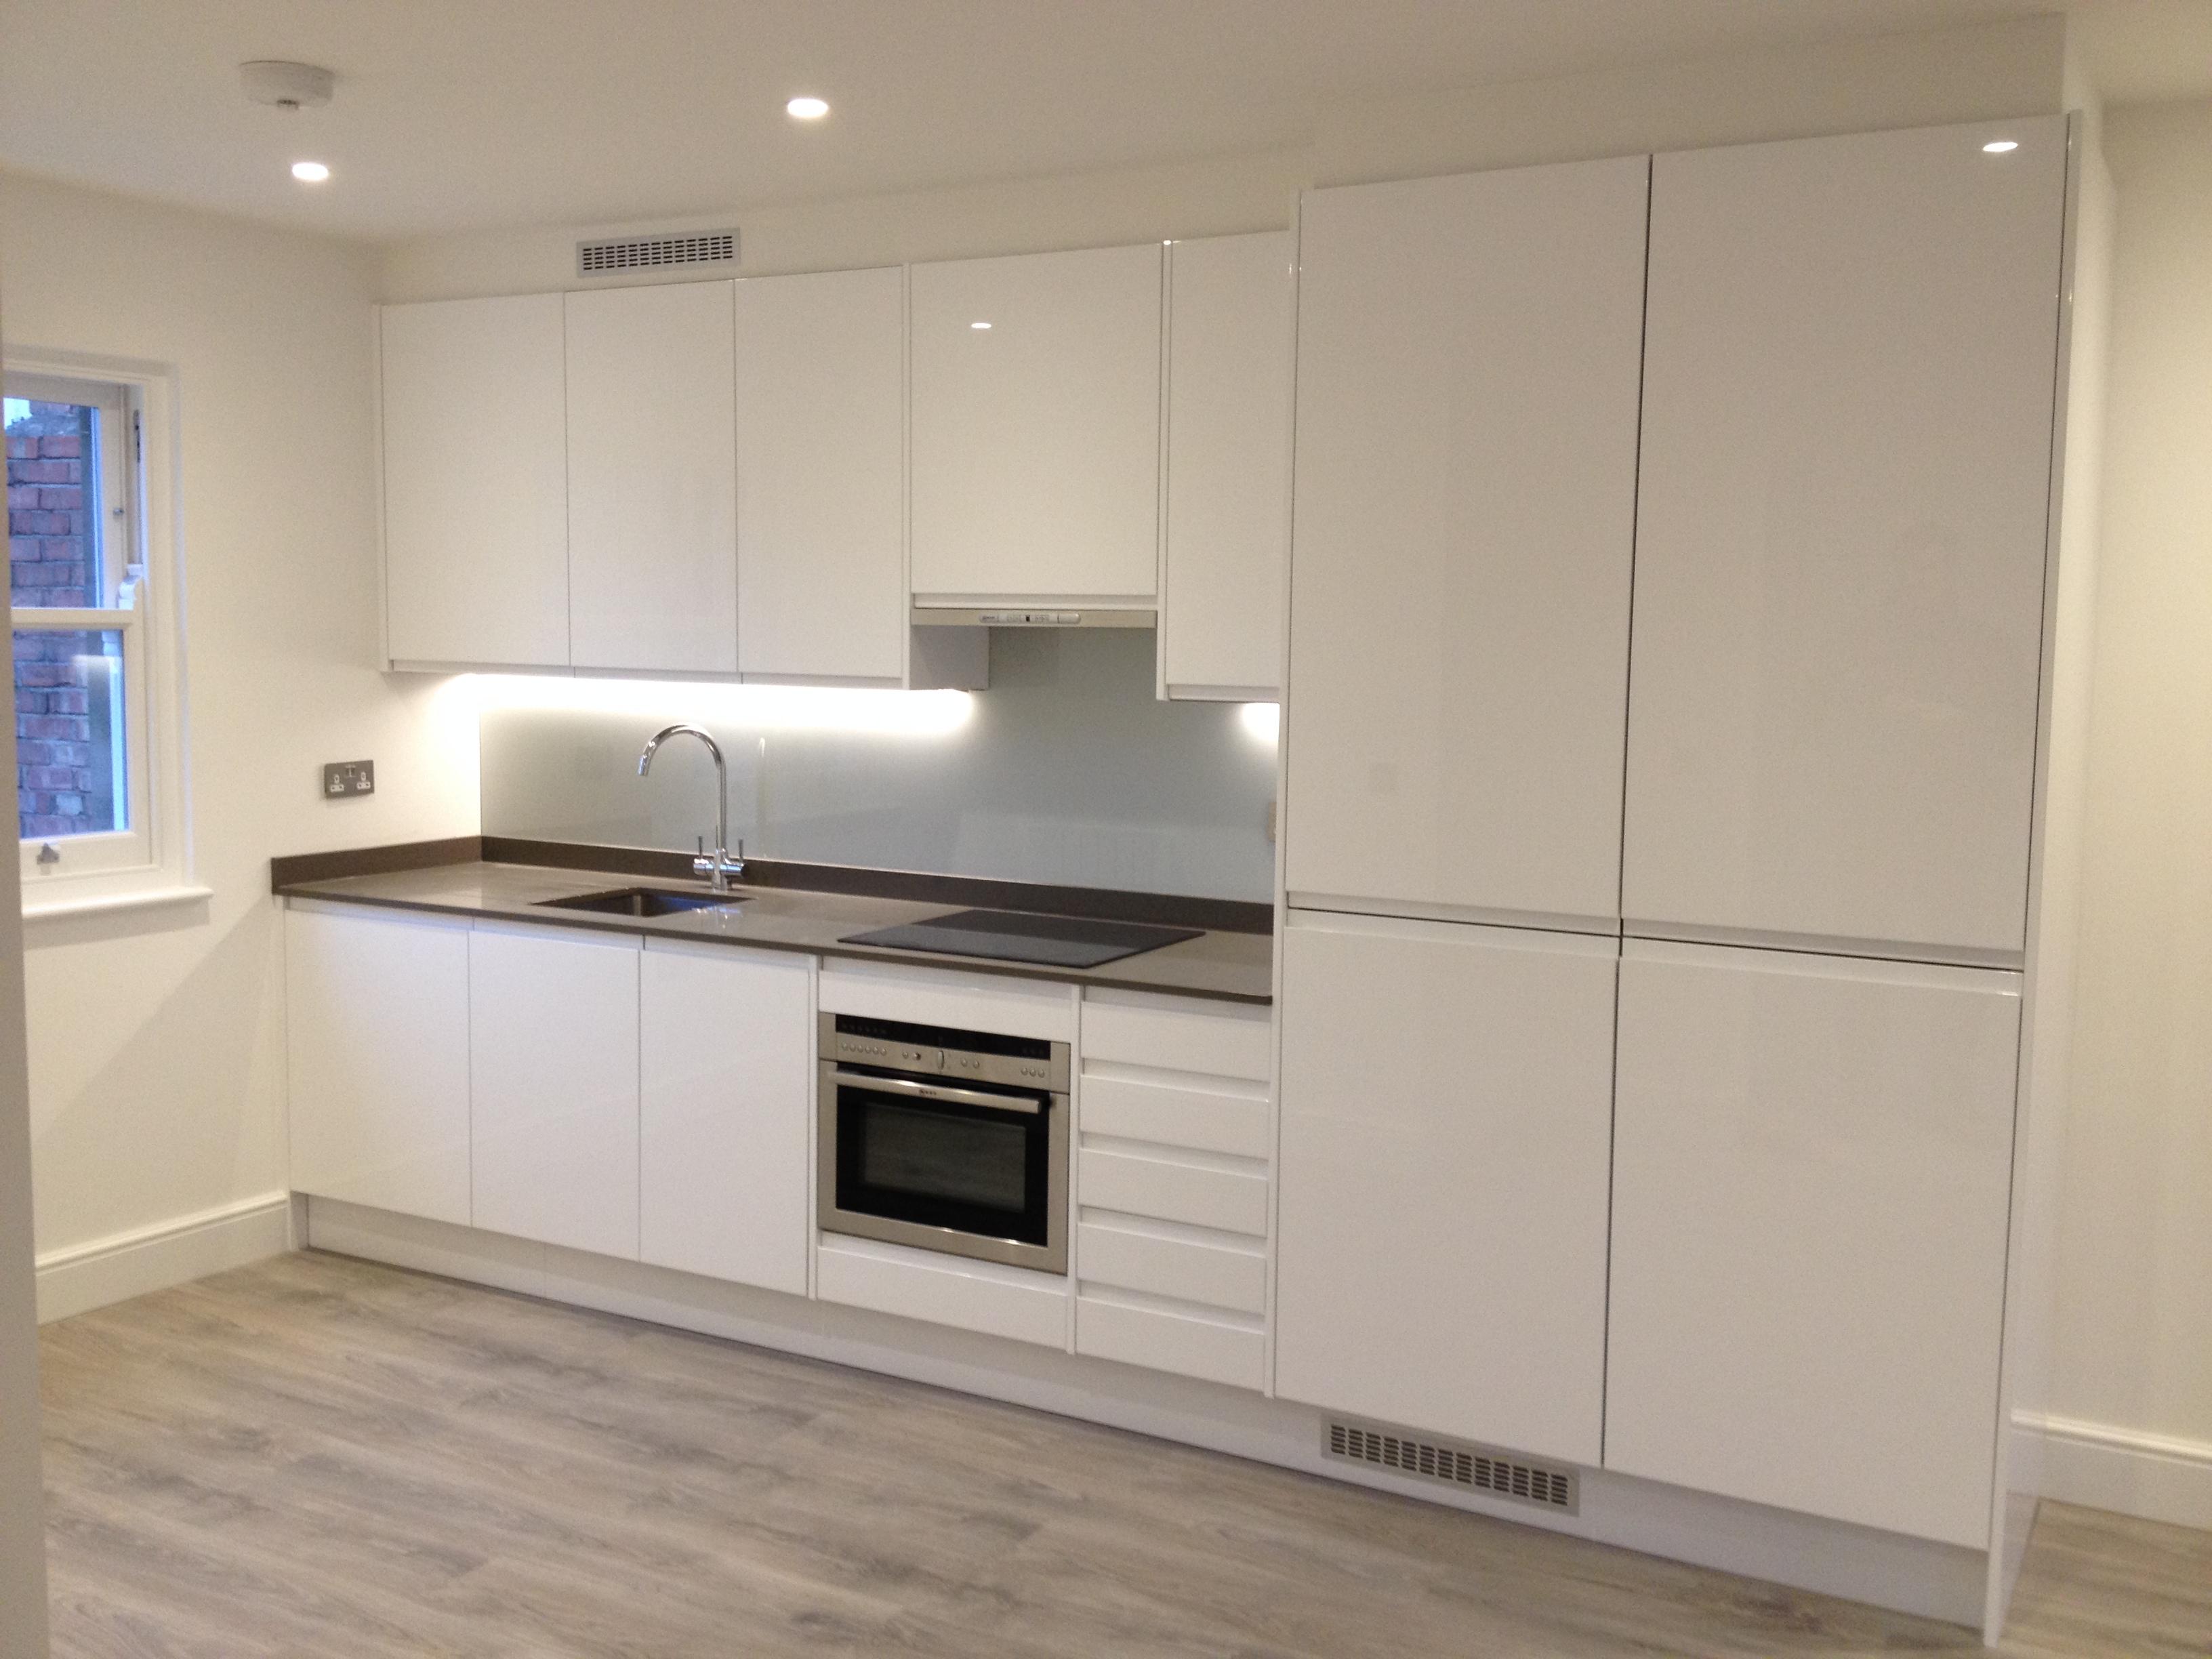 Gloss Matt Wood Kitchen Finishes: Handleless Kitchen Doors, Gloss And Matt